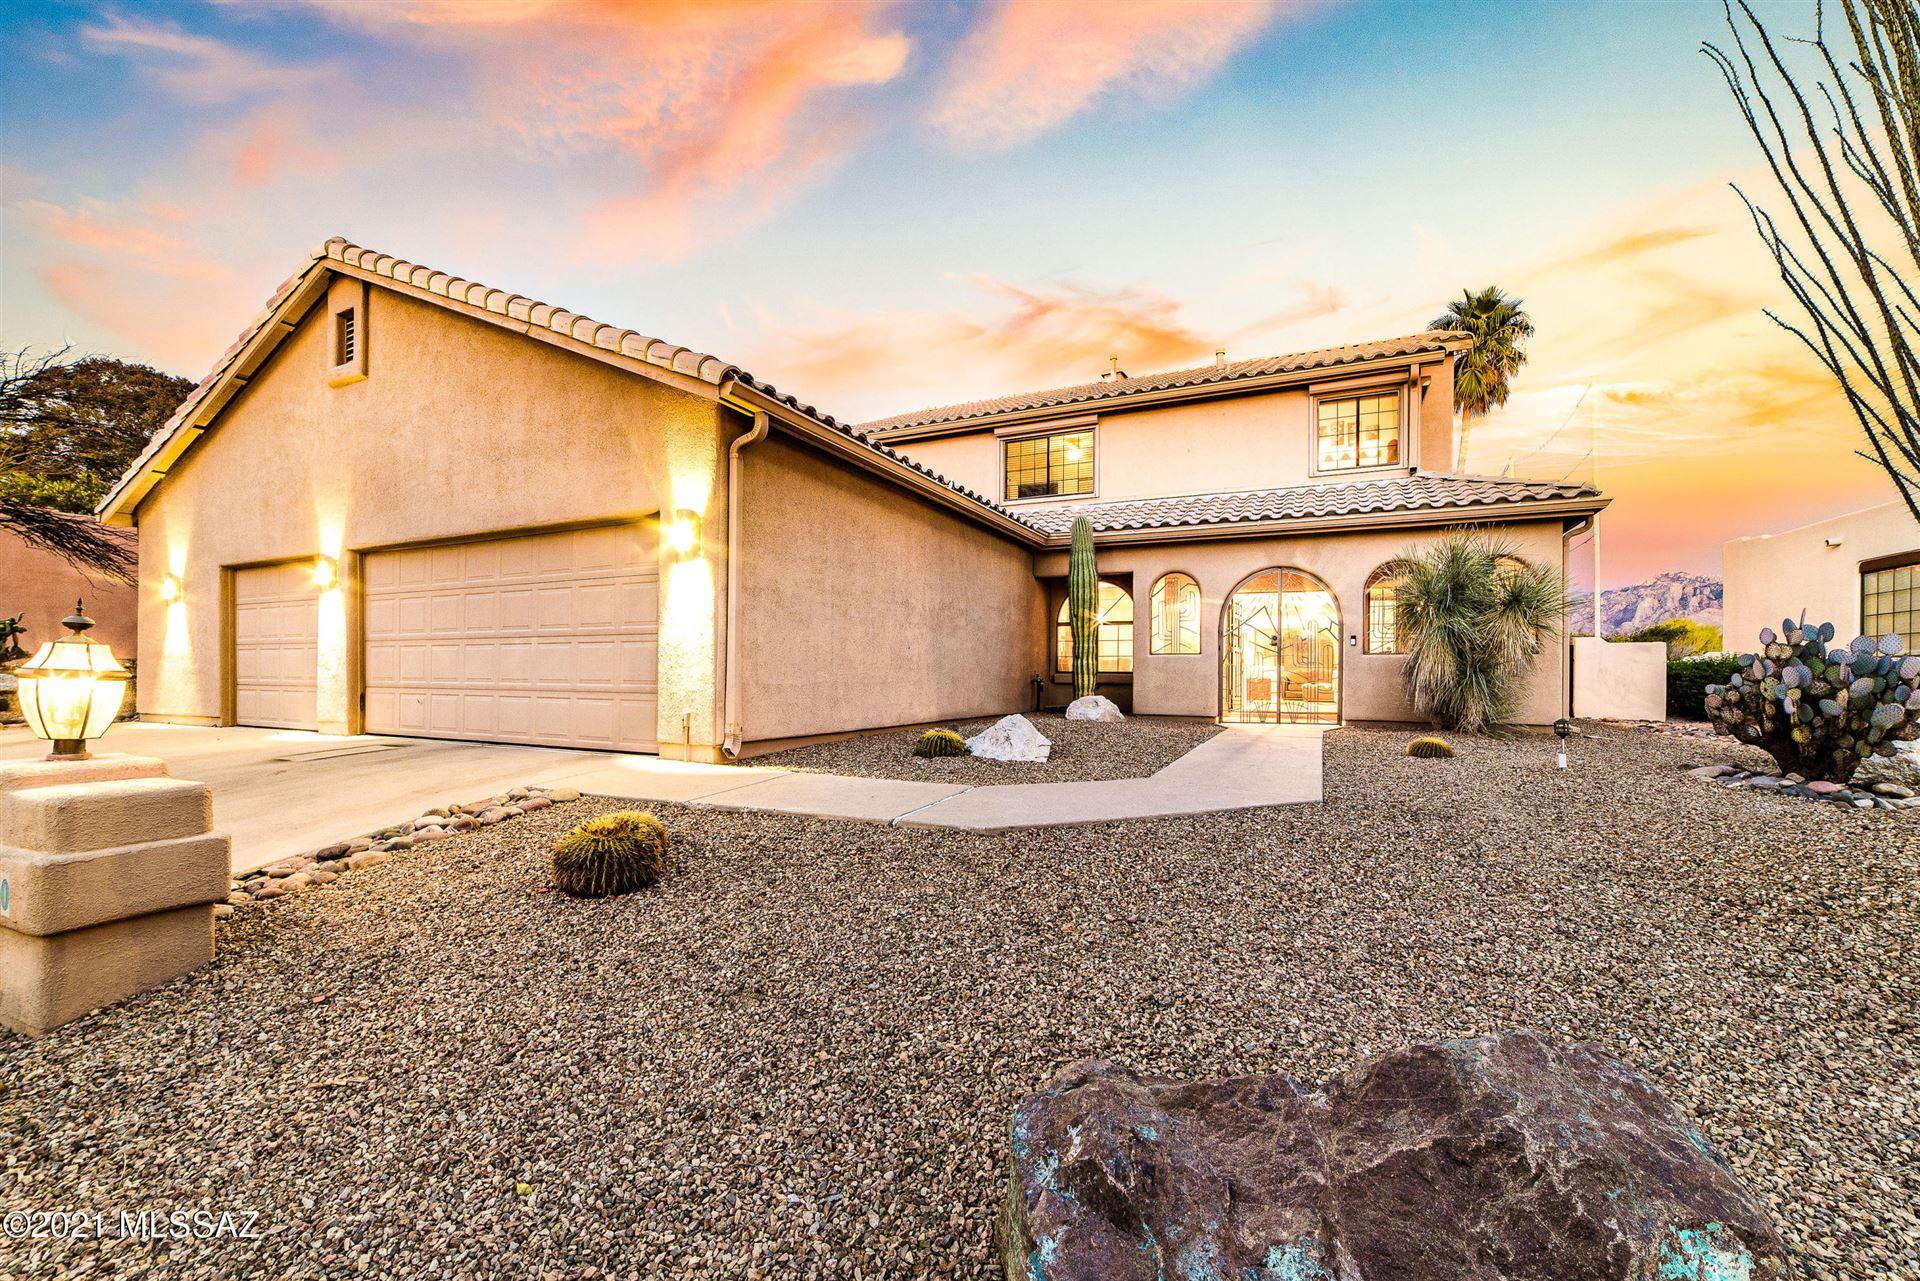 10710 N Sundust Court, Oro Valley, AZ 85737 - MLS#: 22103109